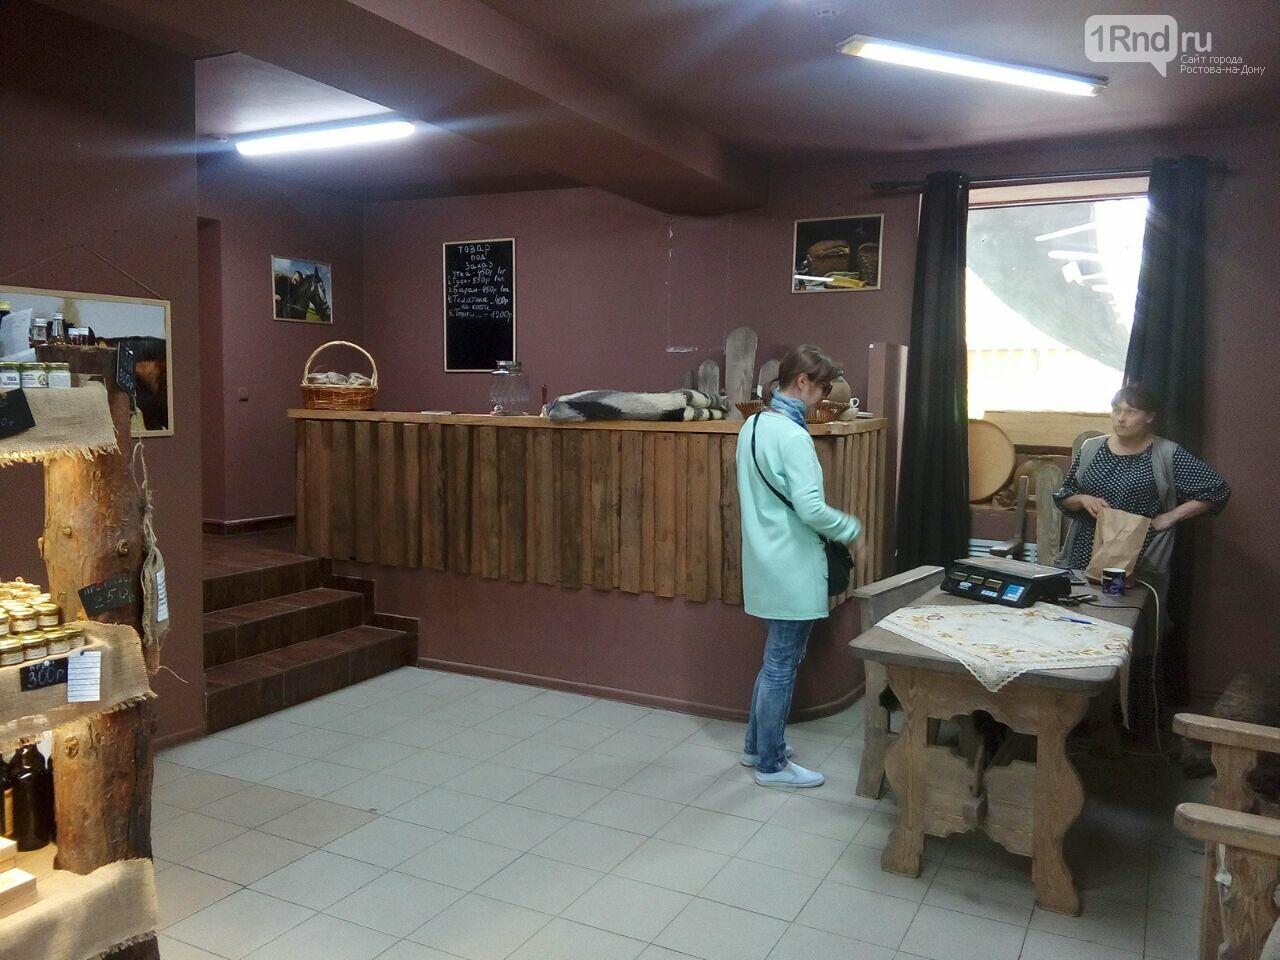 В Ростове лавку Стерлигова закрыли журналисты, фото-3, Фото: Анна Дунаева / 1rnd.ru